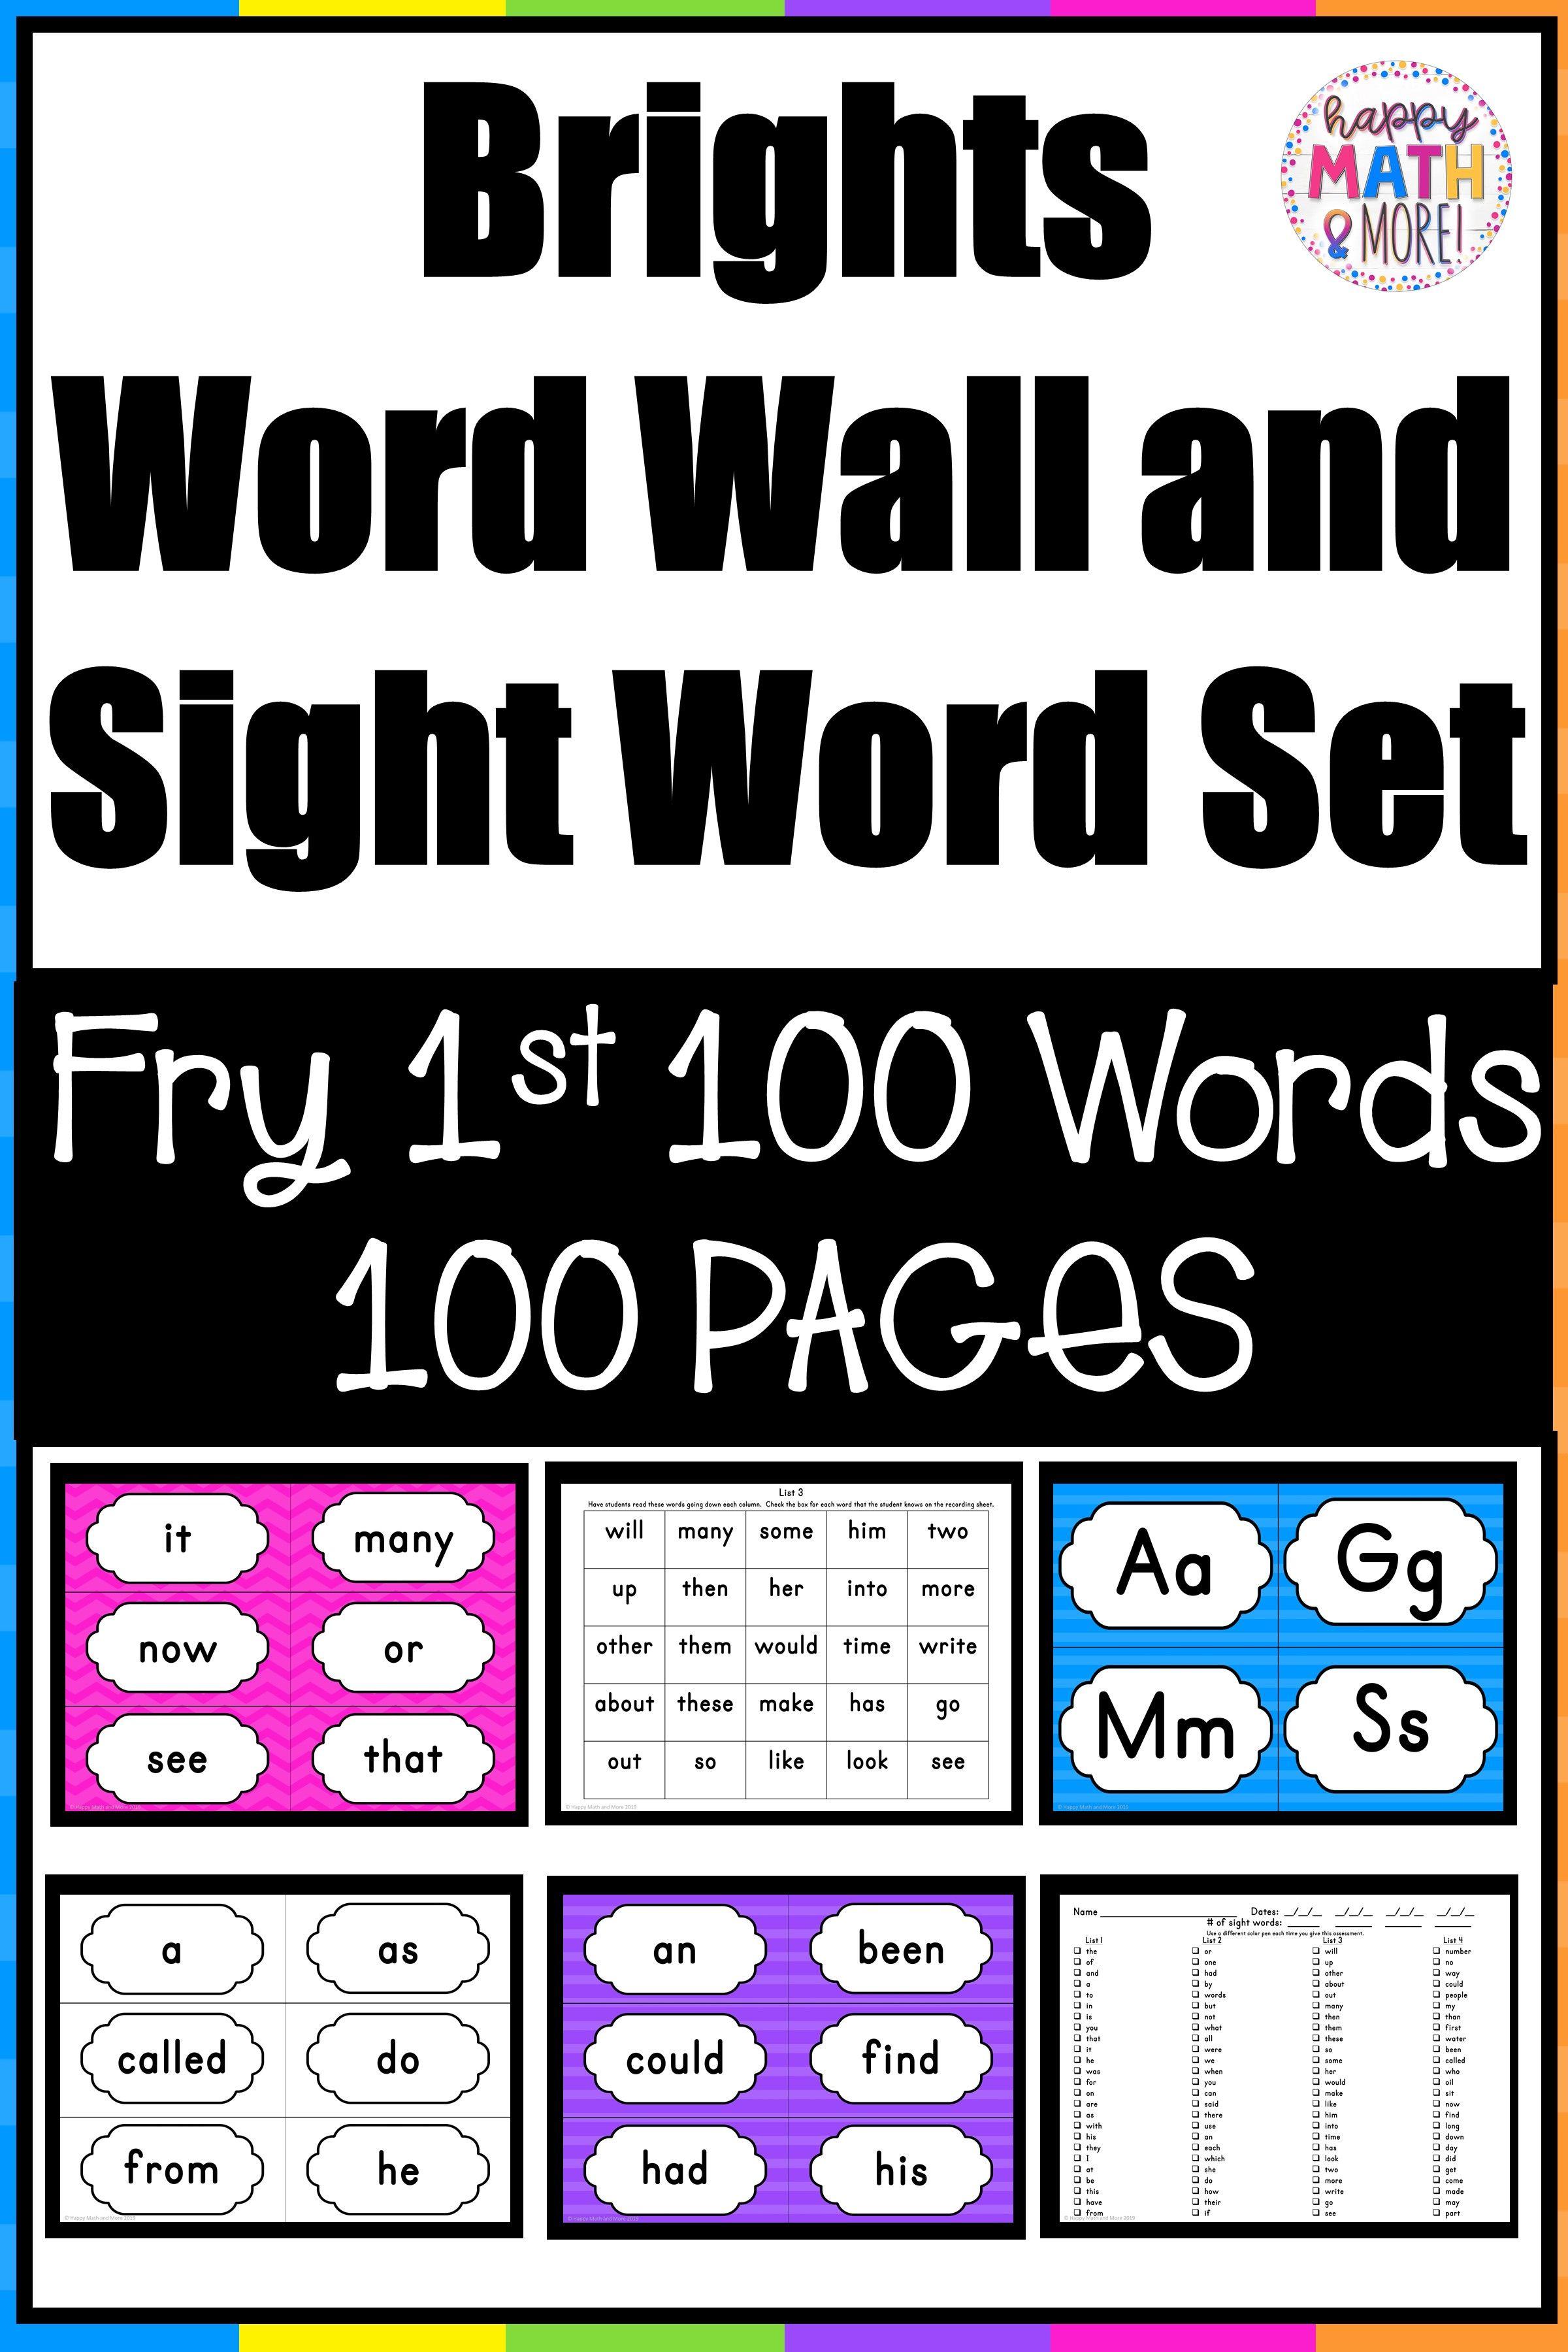 Brights Word Wall And Sight Word Set